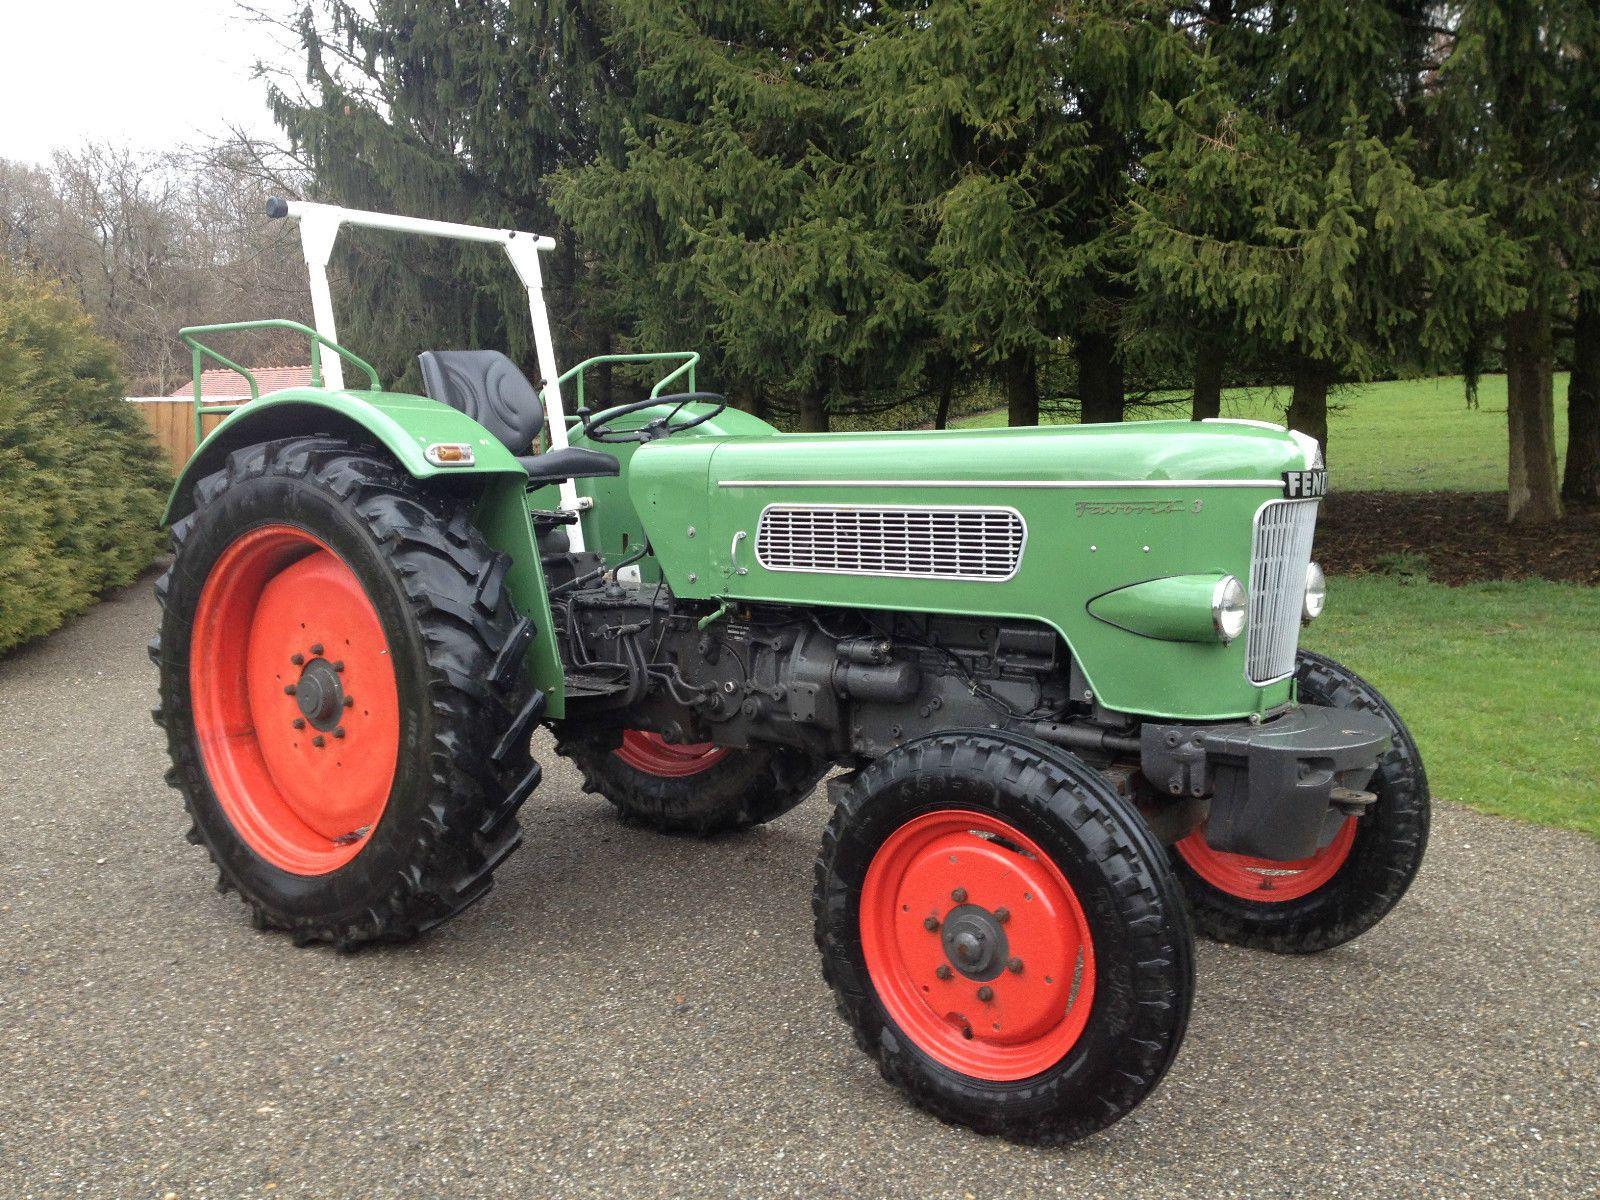 Fendt Favorit3 55ps Bj1967 Ca 30kmh Topzustand Absolutes Schmuckstuck Tuv Neu Ebay Fendt Fendt Traktor Alte Traktoren